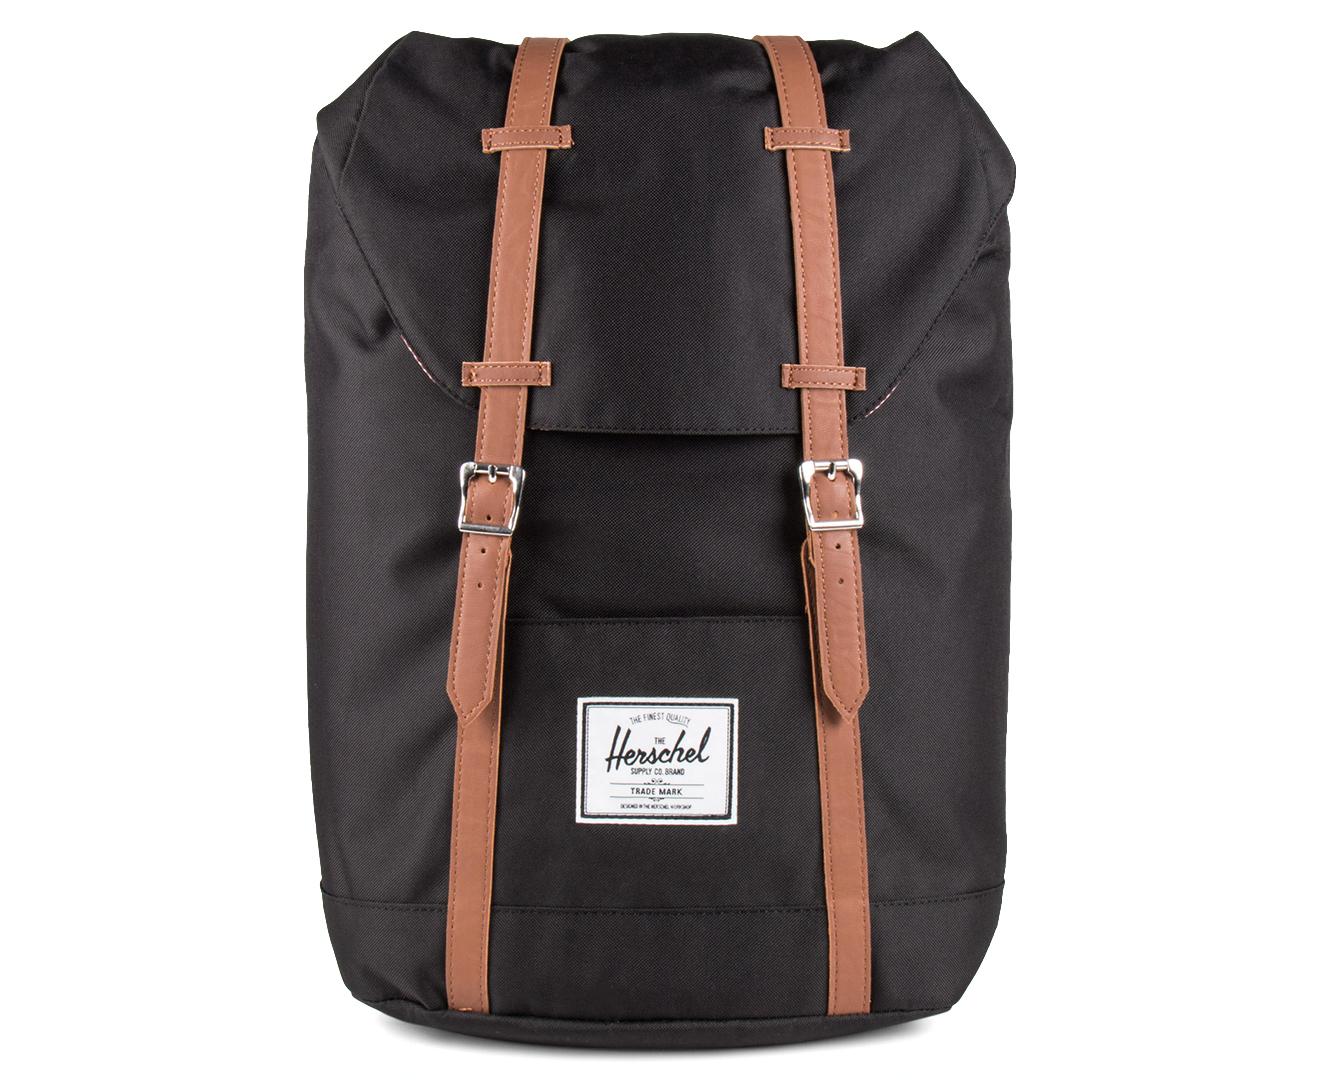 Herschel Supply Co. 19.5L Retreat Backpack - Black 828432018734   eBay 24ecda14a8